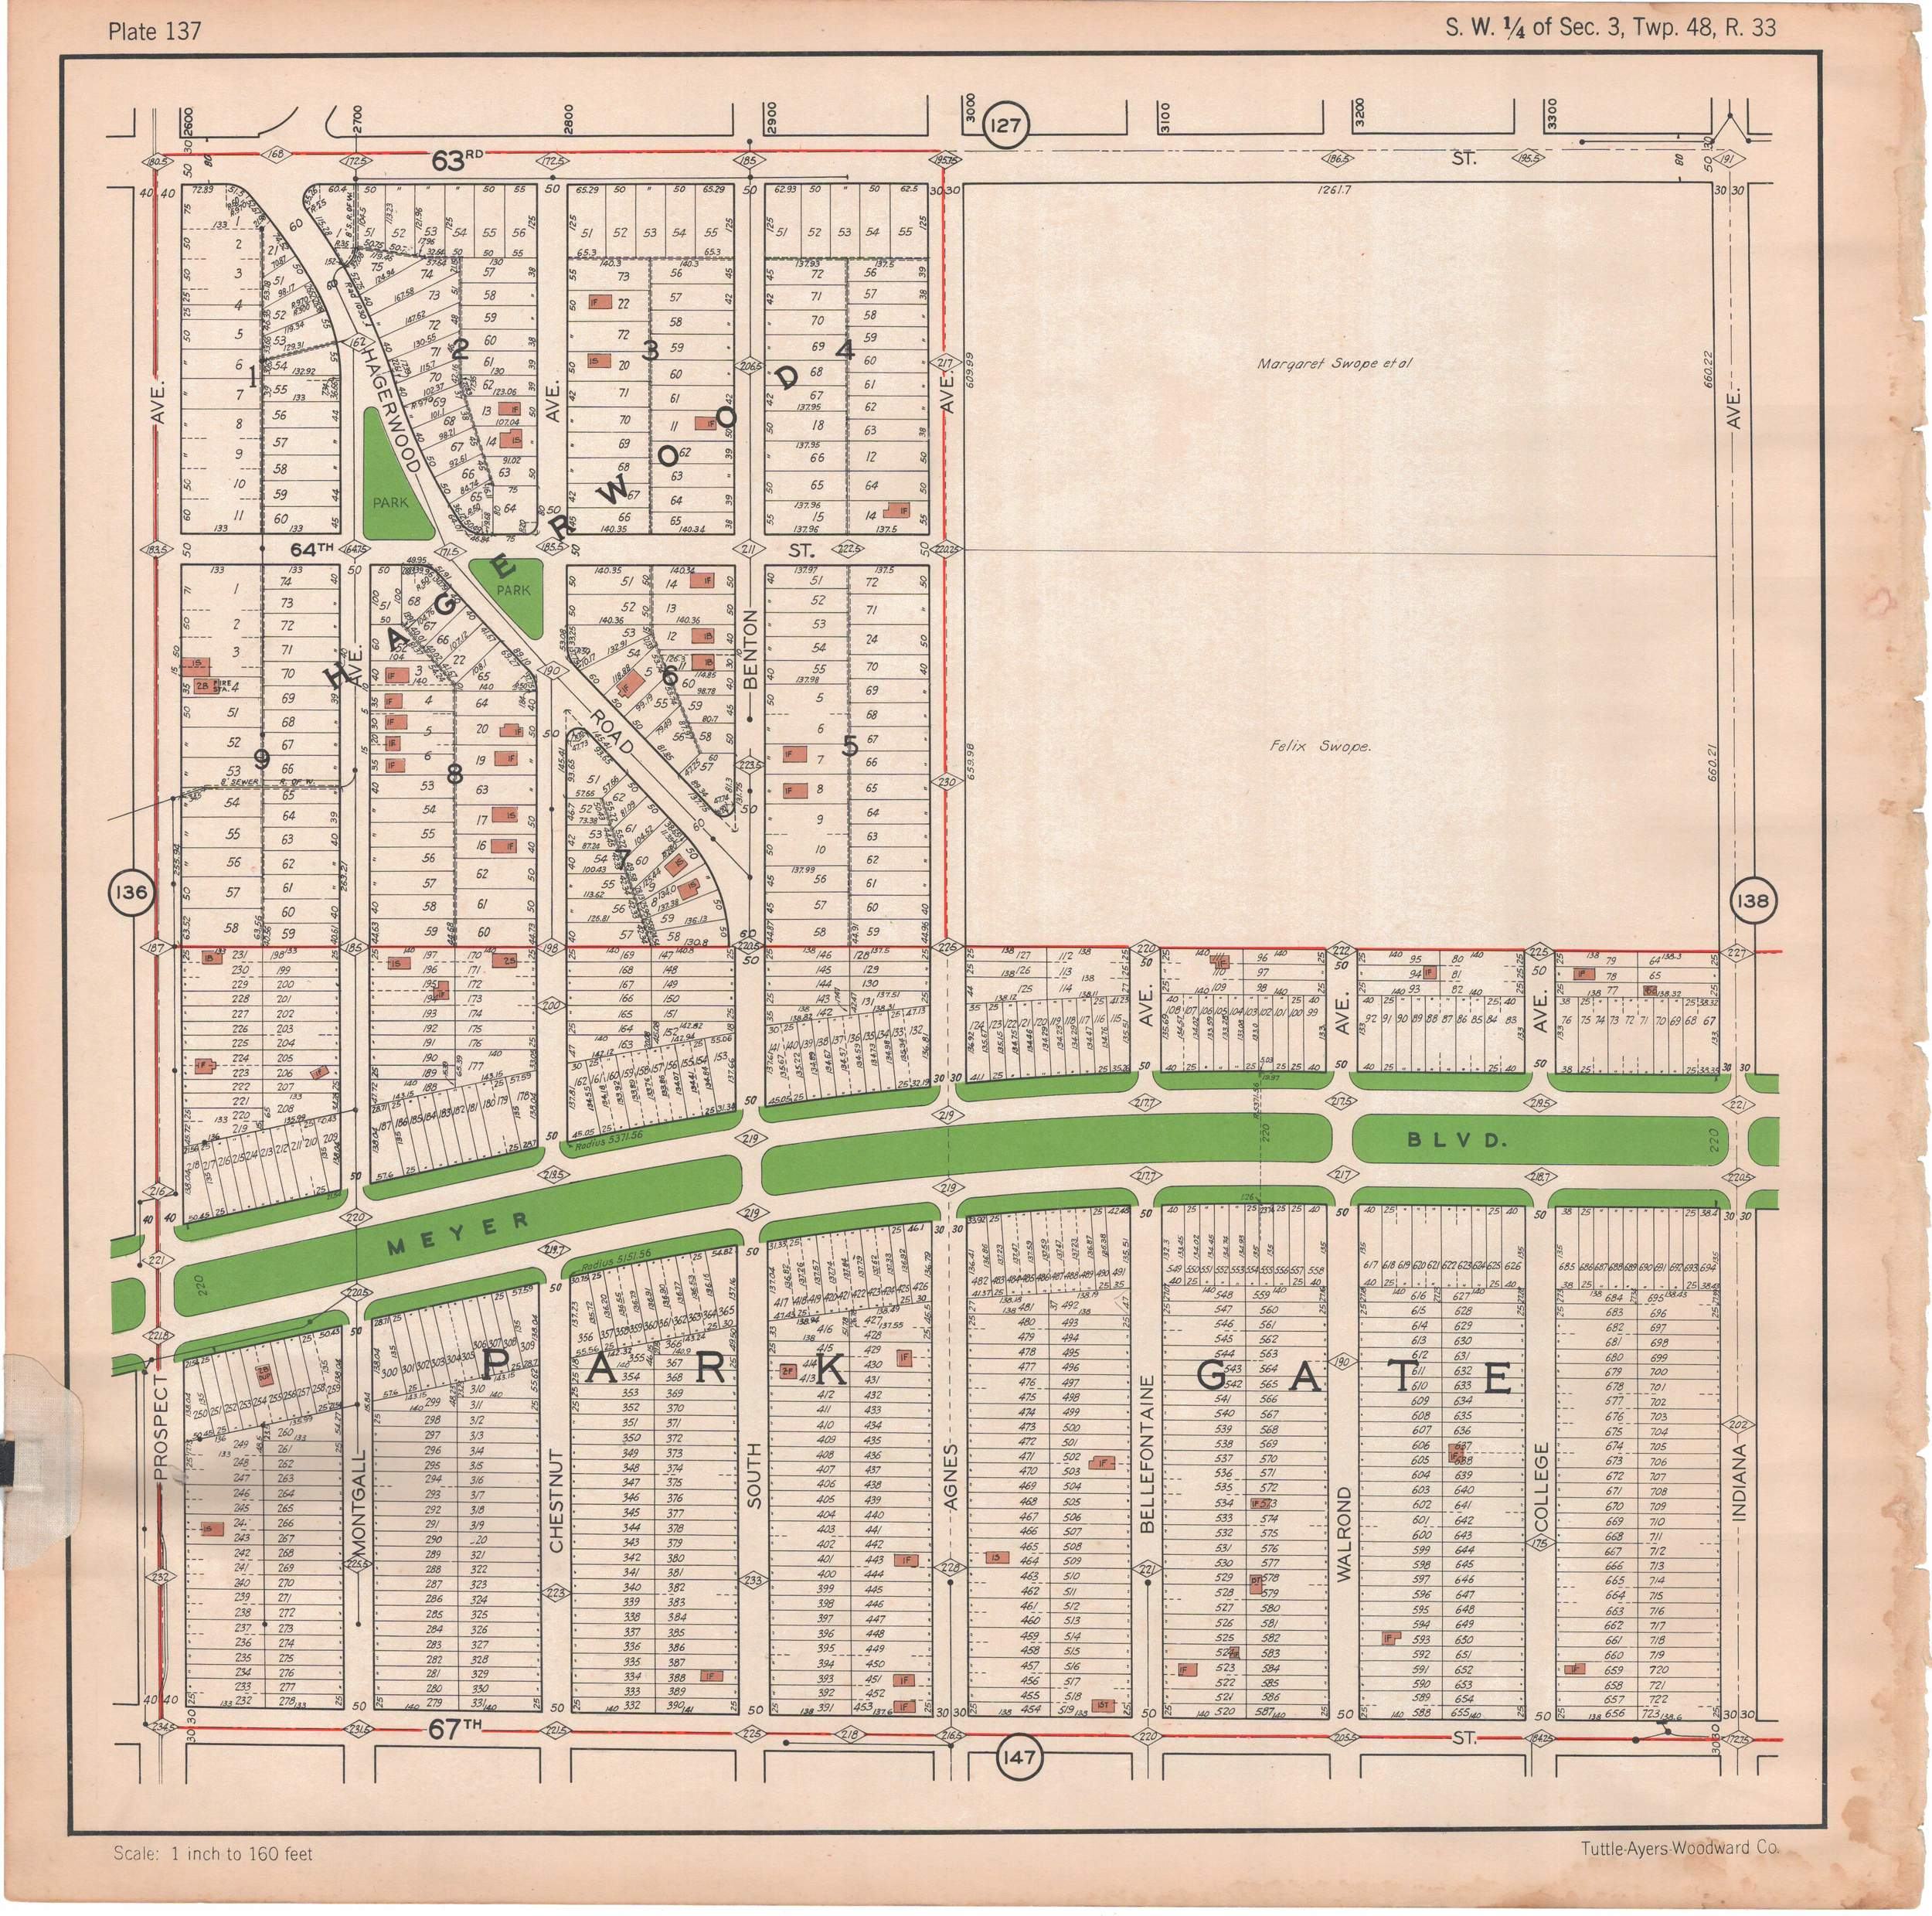 1925 TUTTLE_AYERS_Plate_137.JPG